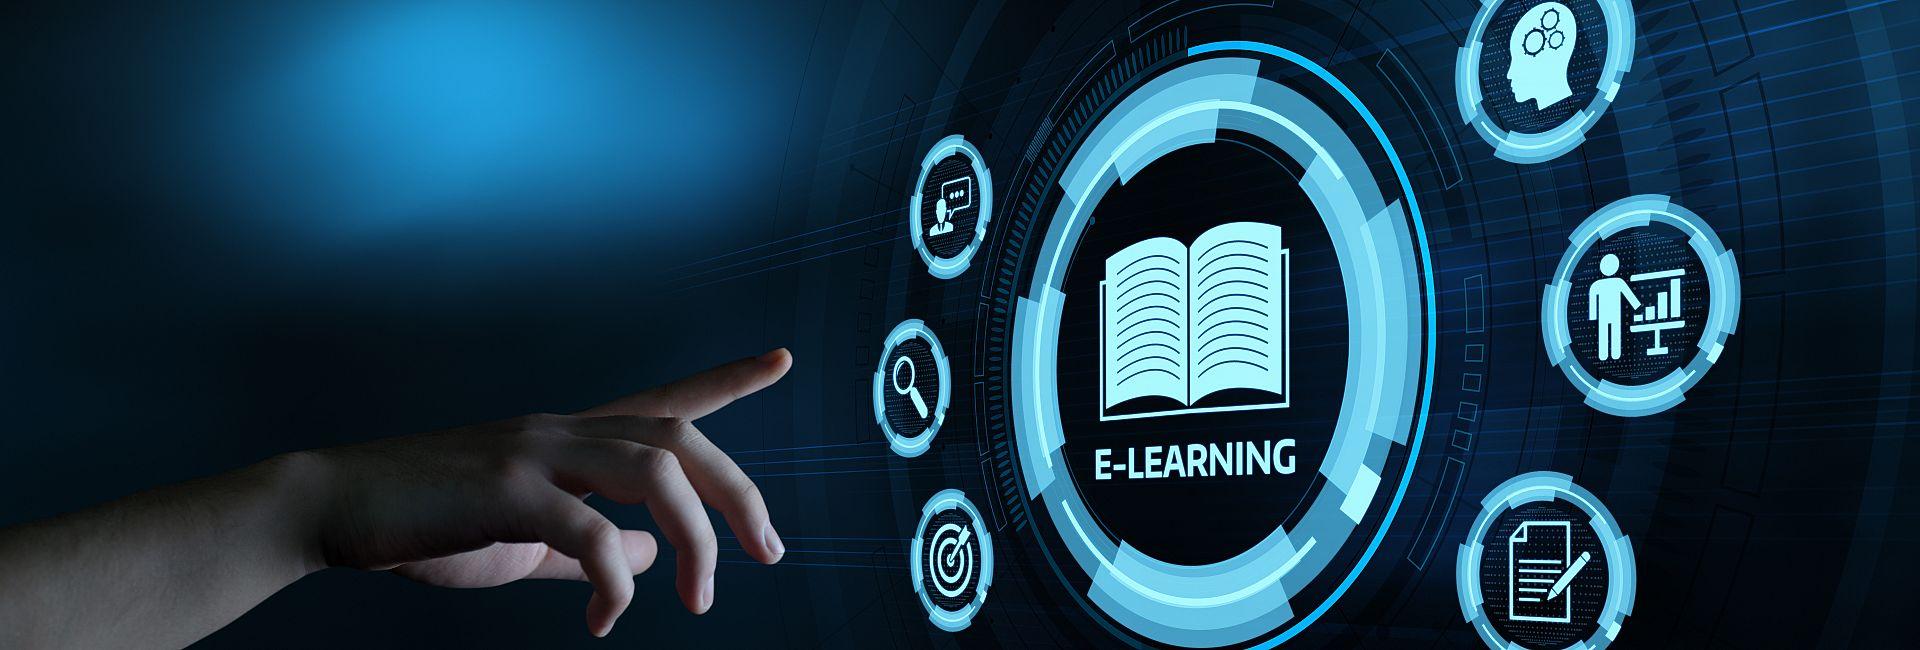 Međunarodna konferencija o e-obrazovanju: Advancing Education: people, institutions, technology